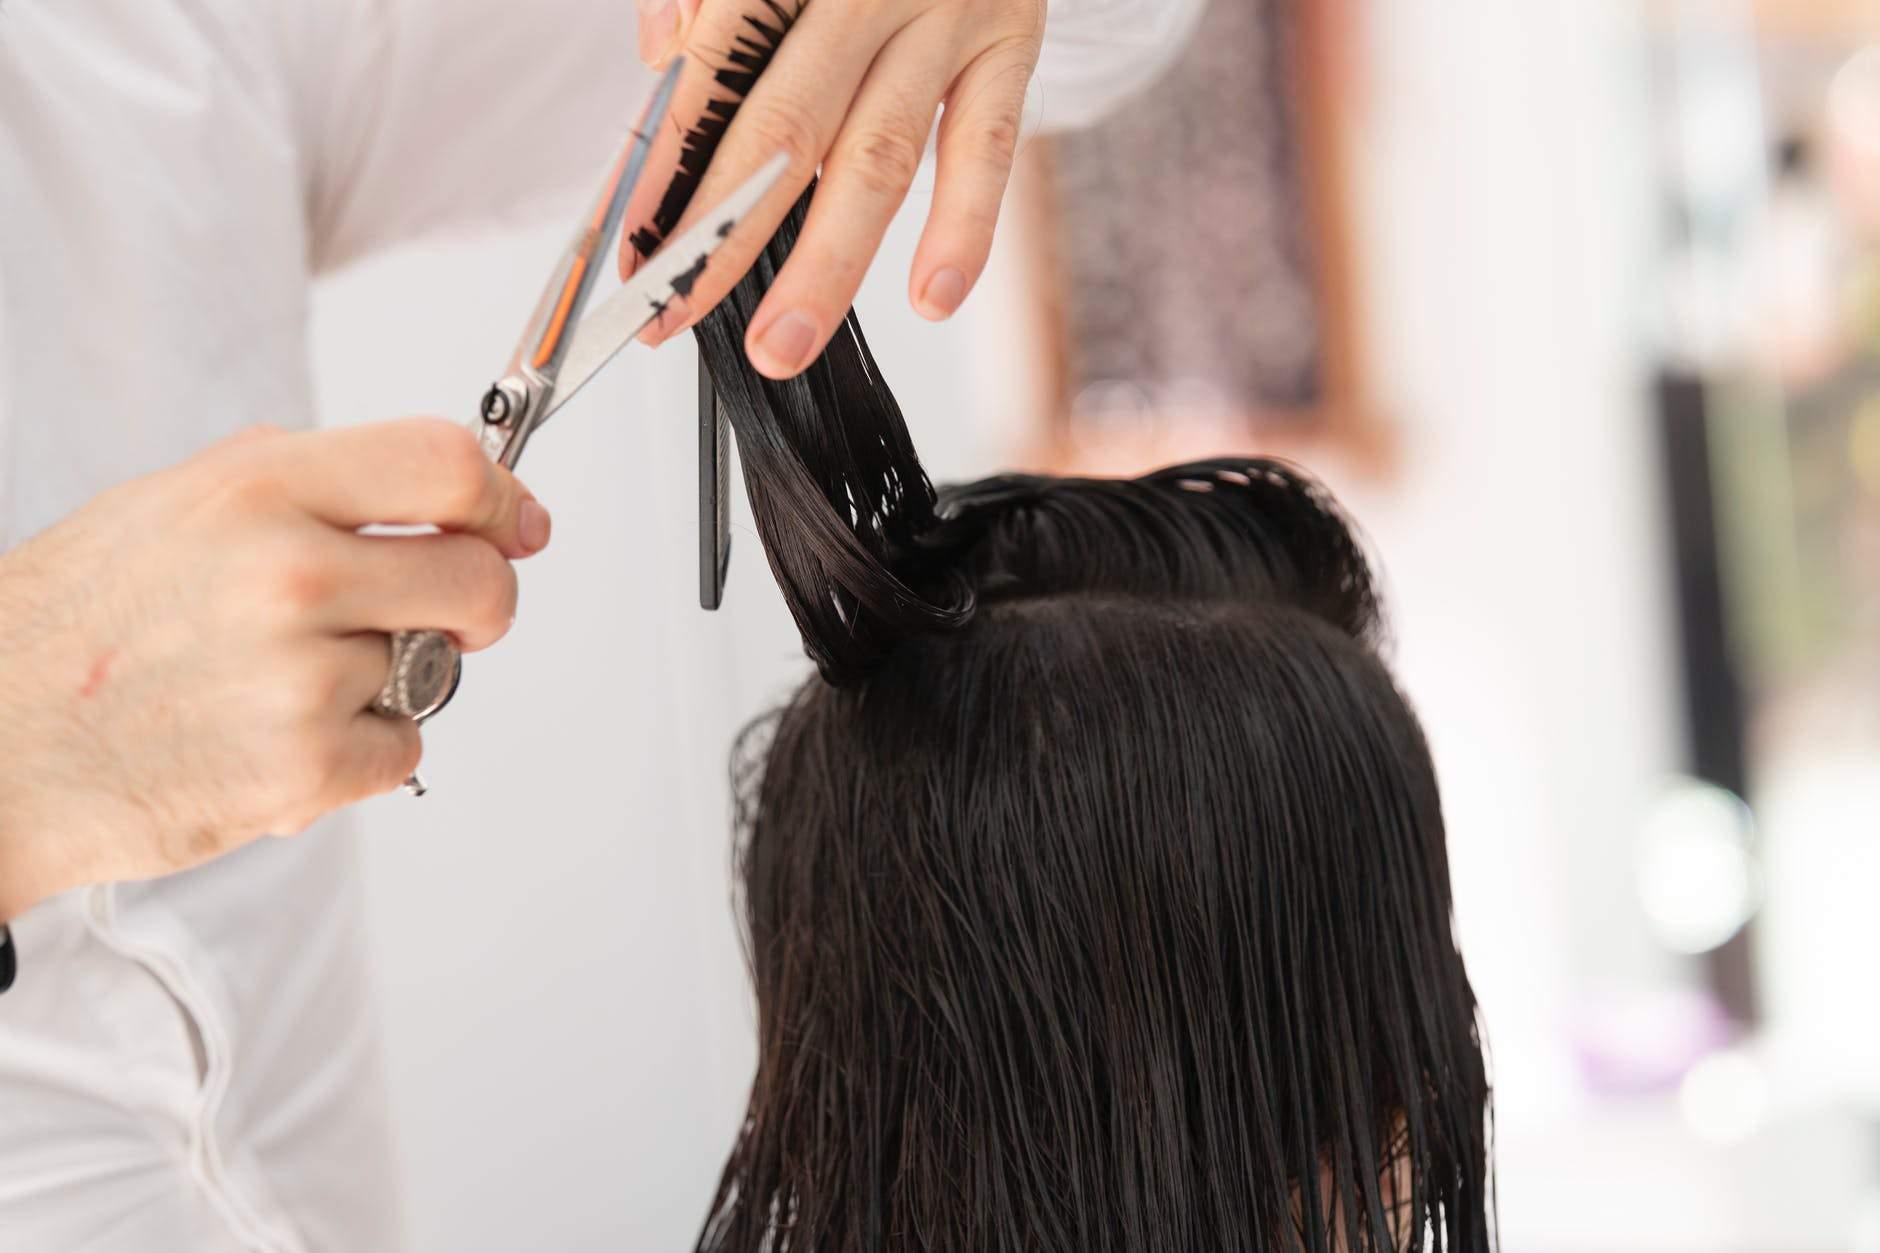 Як доглядати за волоссям весною